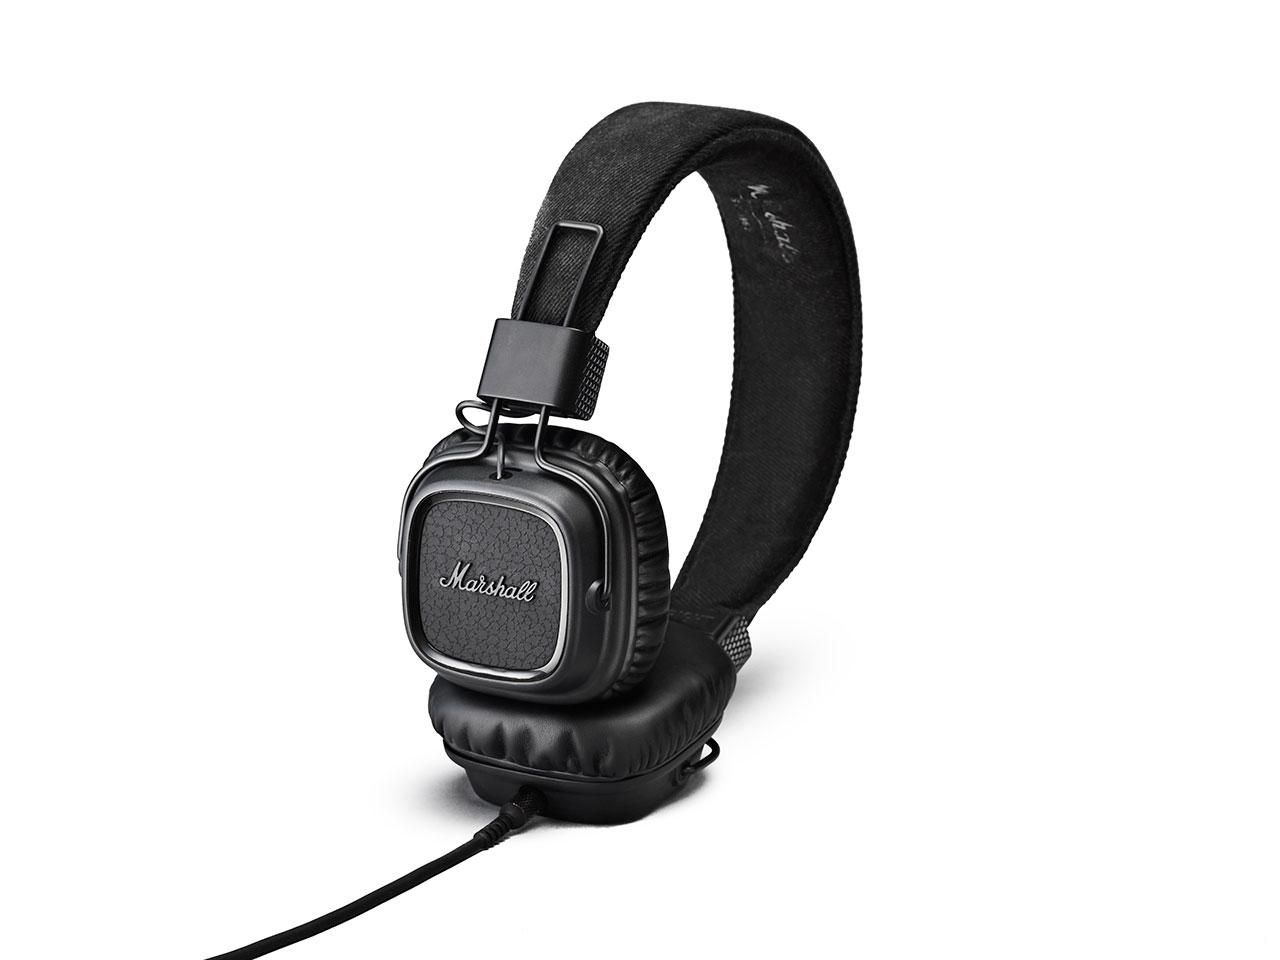 Marshall Major II Pitch Black, uzavřená sluchátka s mikrofonem